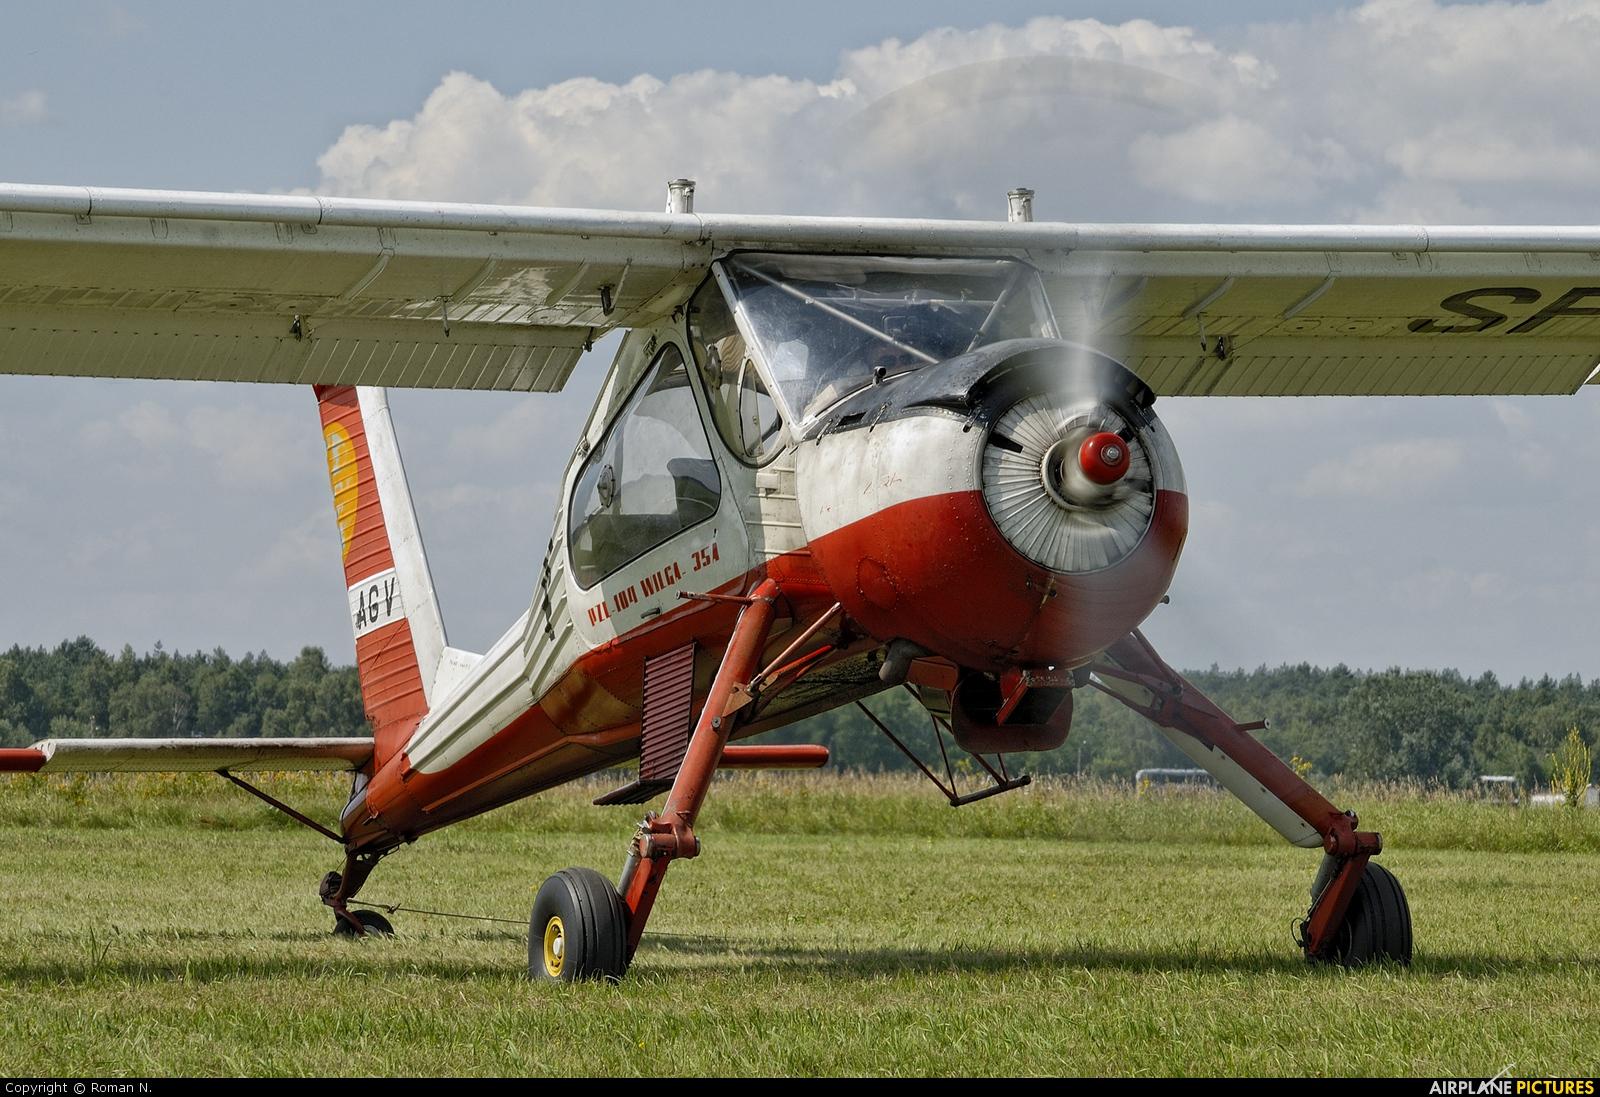 Aeroklub Bydgoski SP-AGV aircraft at Bydgoszcz - Szwederowo